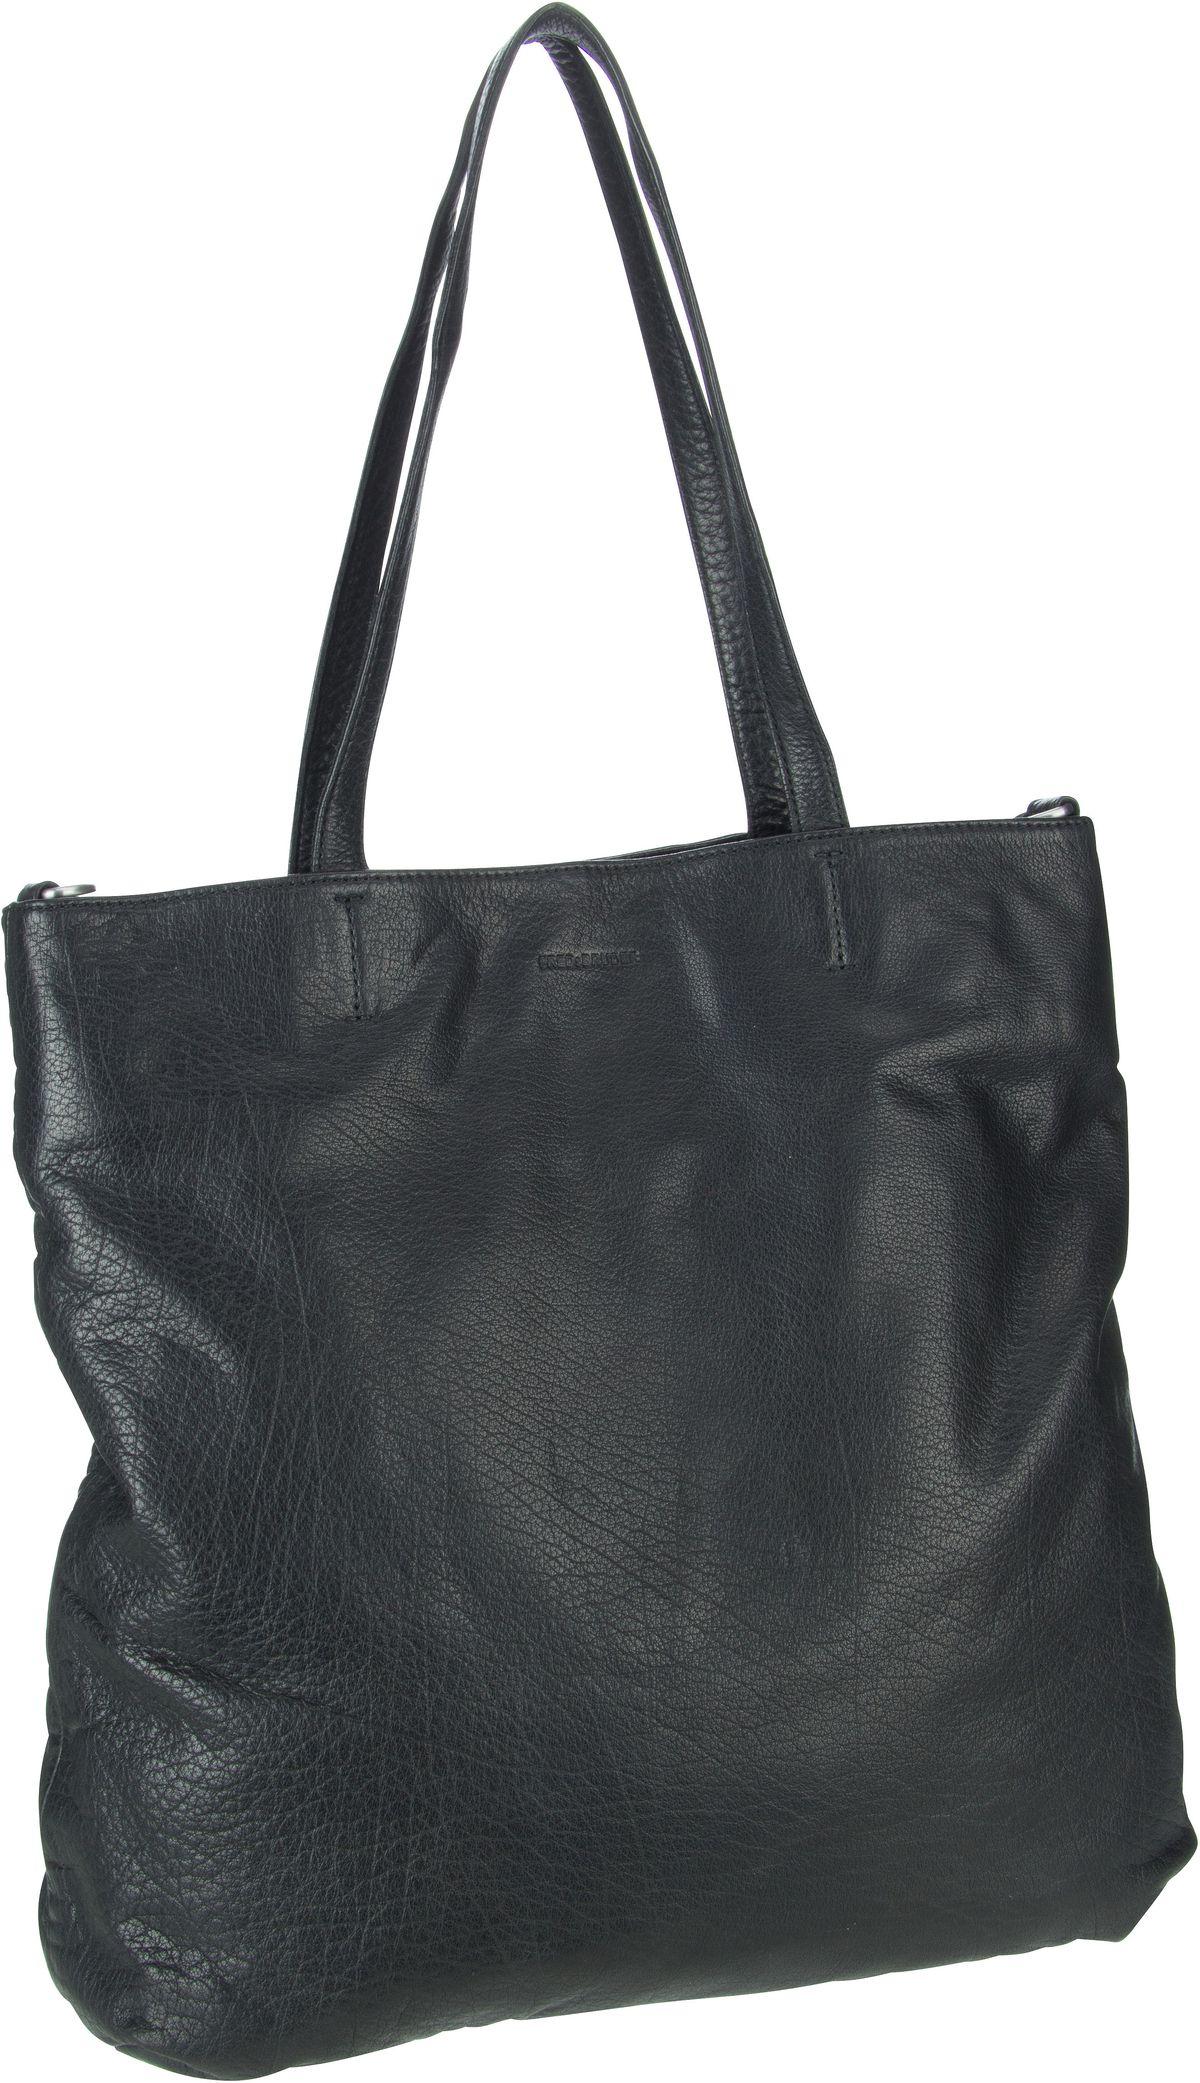 Handtasche Kinky Softy Black